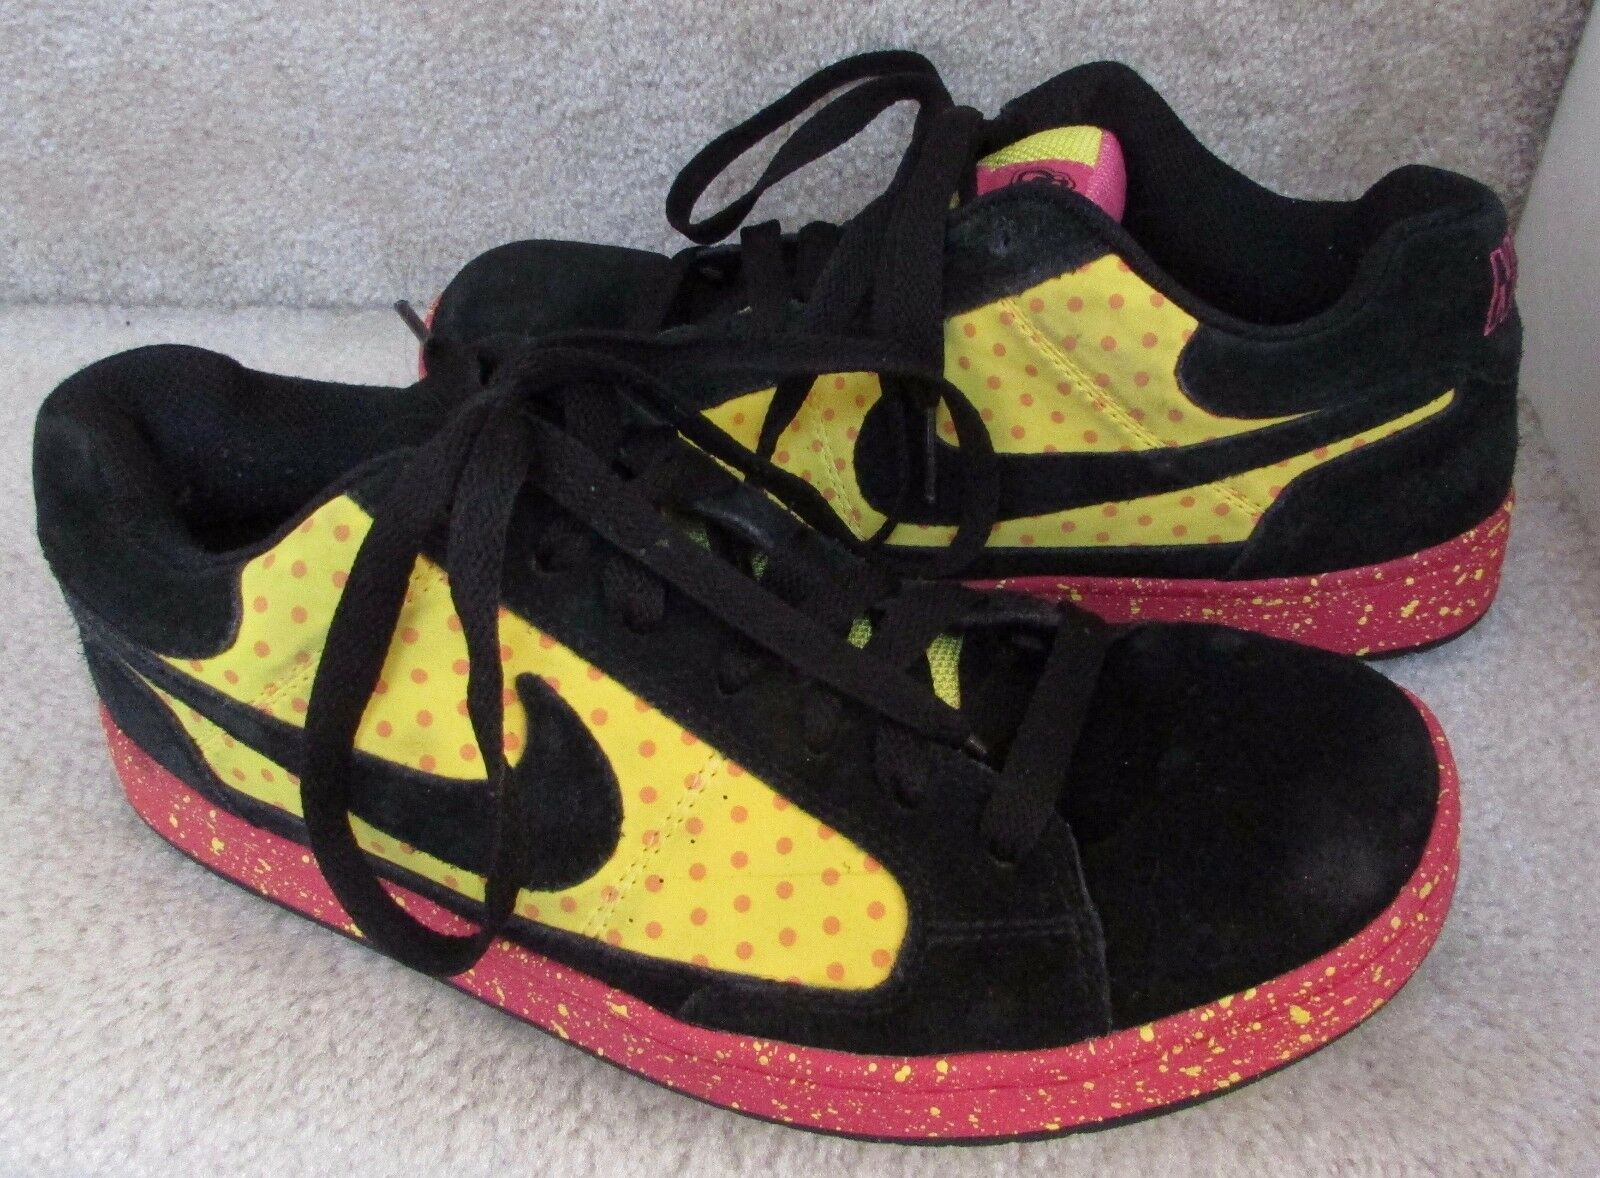 Nike 6.0 Swindle Lam Mens Sneakers Skateboard Shoes Size 9 Samples